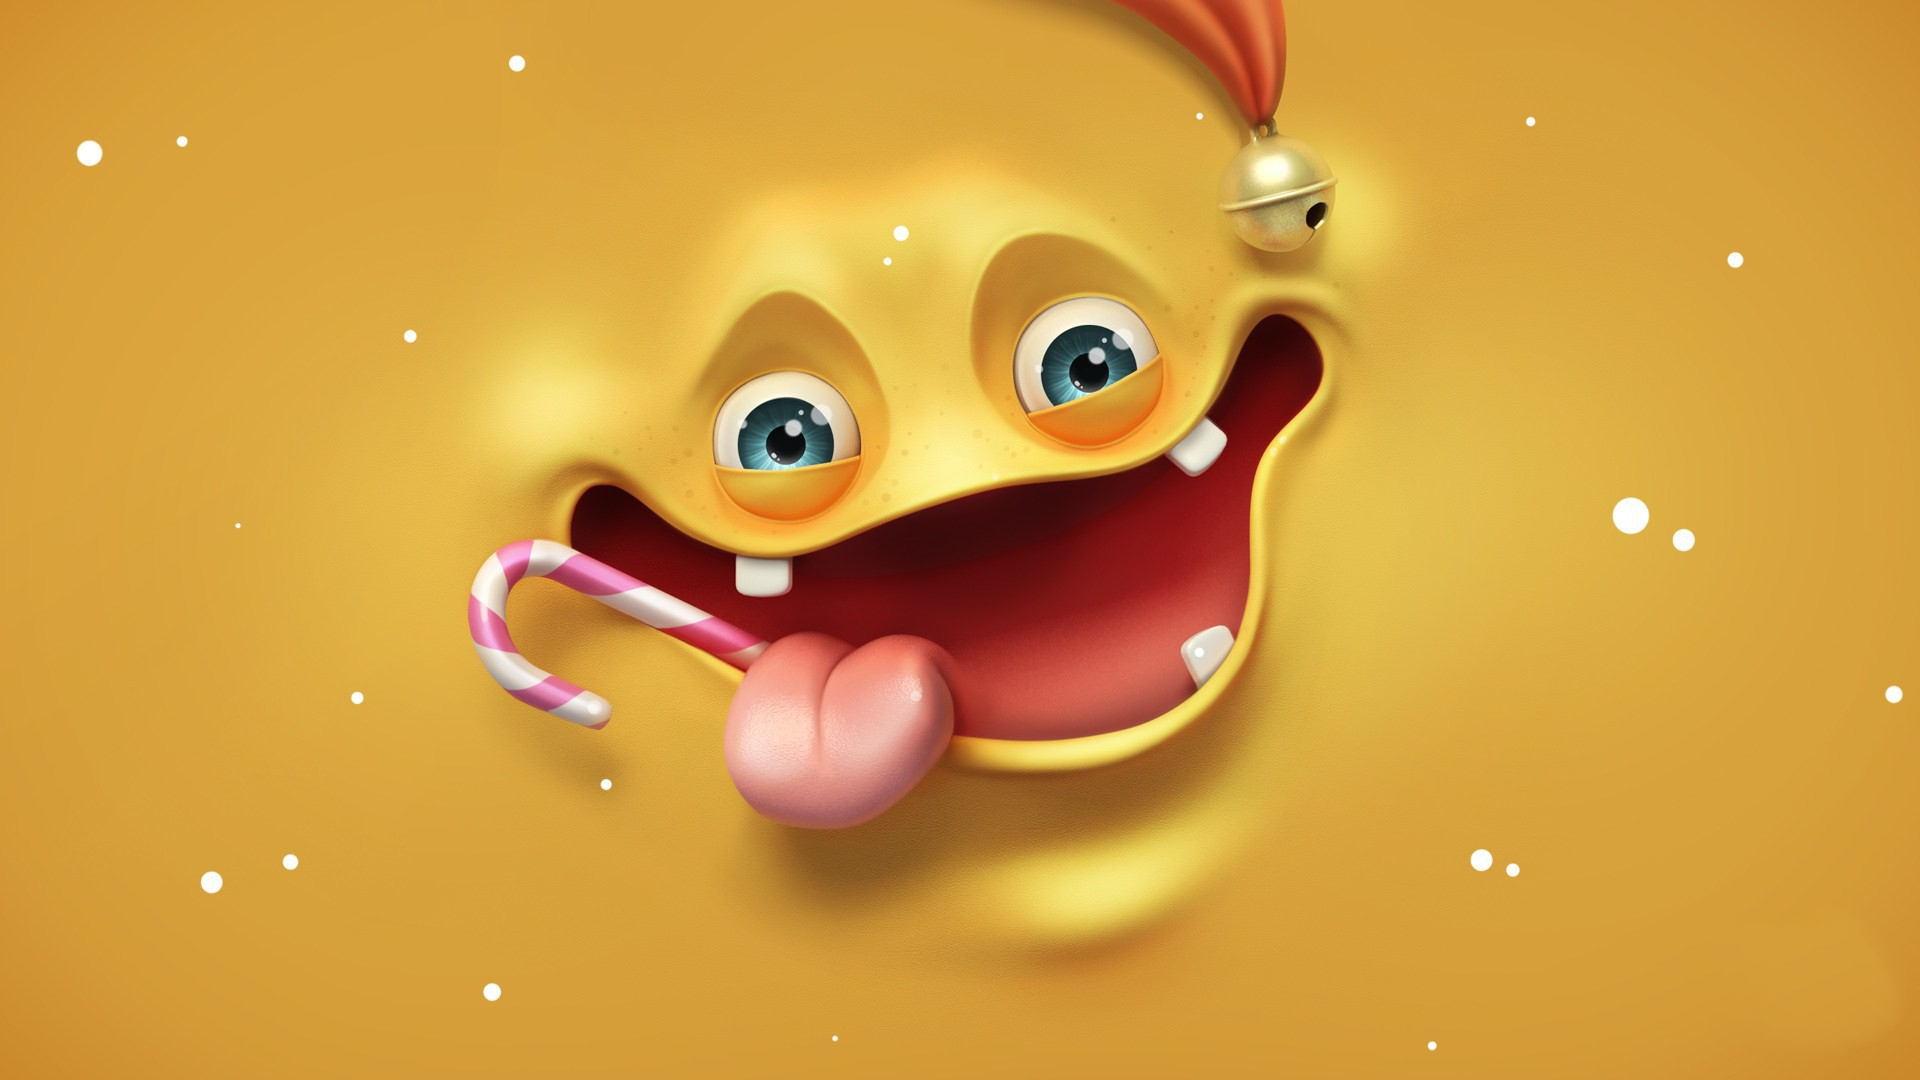 funny desktop wallpapers free download (52 wallpapers) – adorable